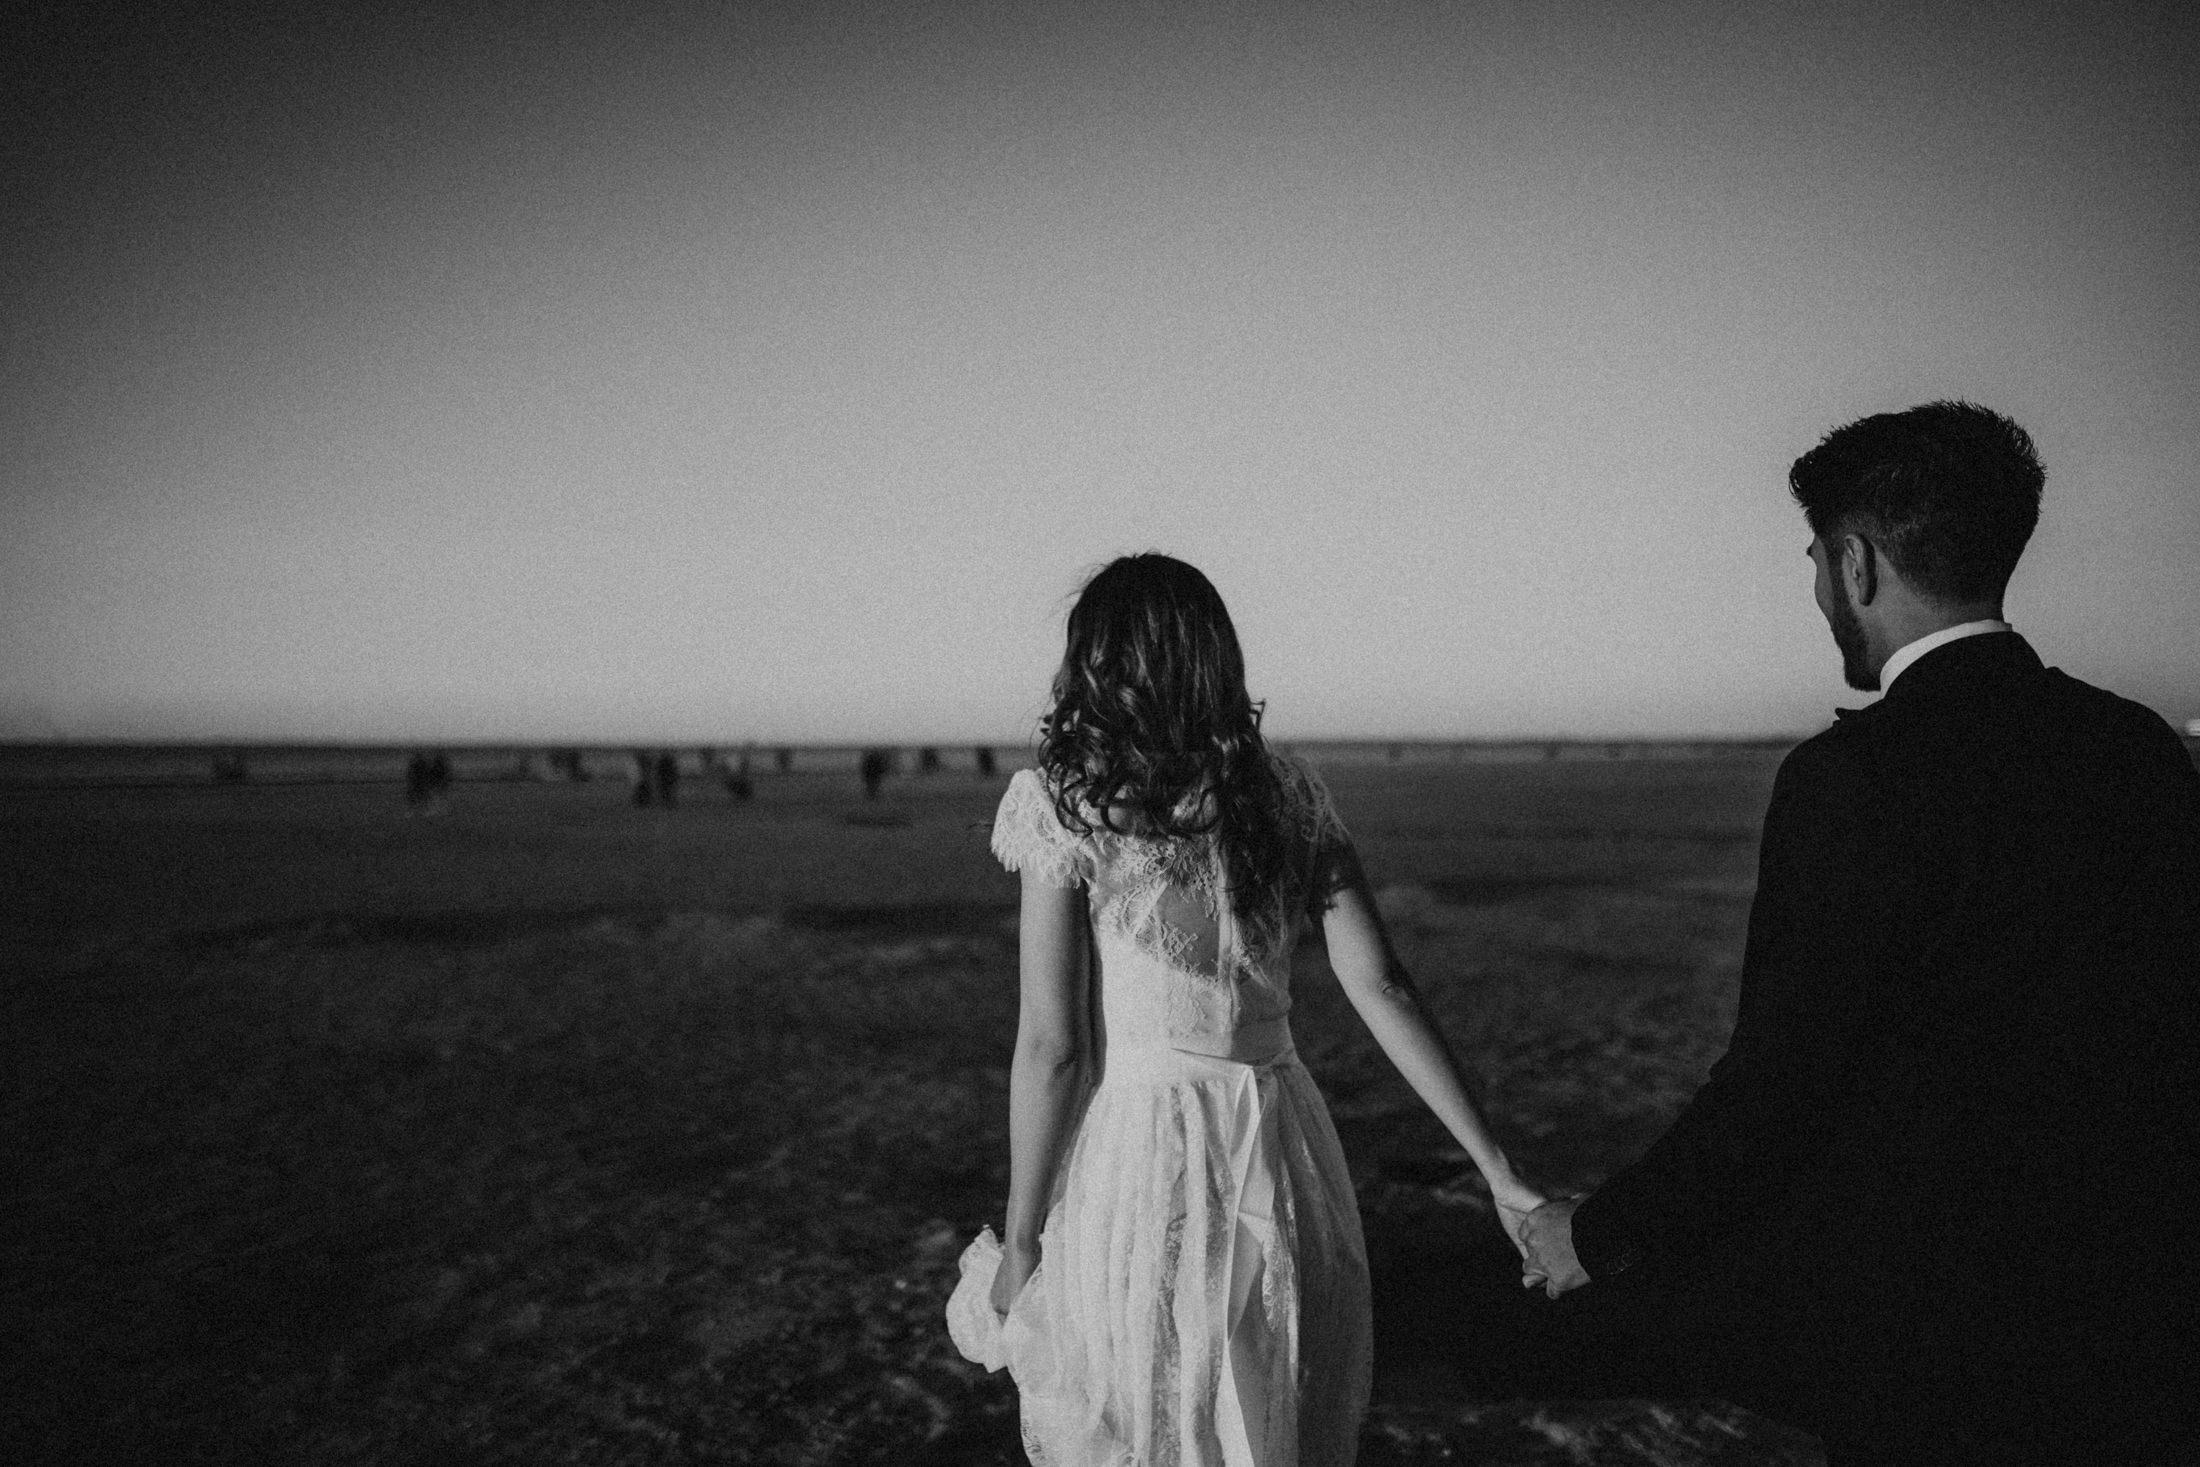 Wedding_Photographer_Mallorca_Daniela-Marquardt_Photography_CanaryIslands_Lanzarote_Iceland_Tuskany_Santorini_Portugal_Schweiz_Austria_Bayern_Elopement_Hochzeitsfotograf_Norddeichich_56